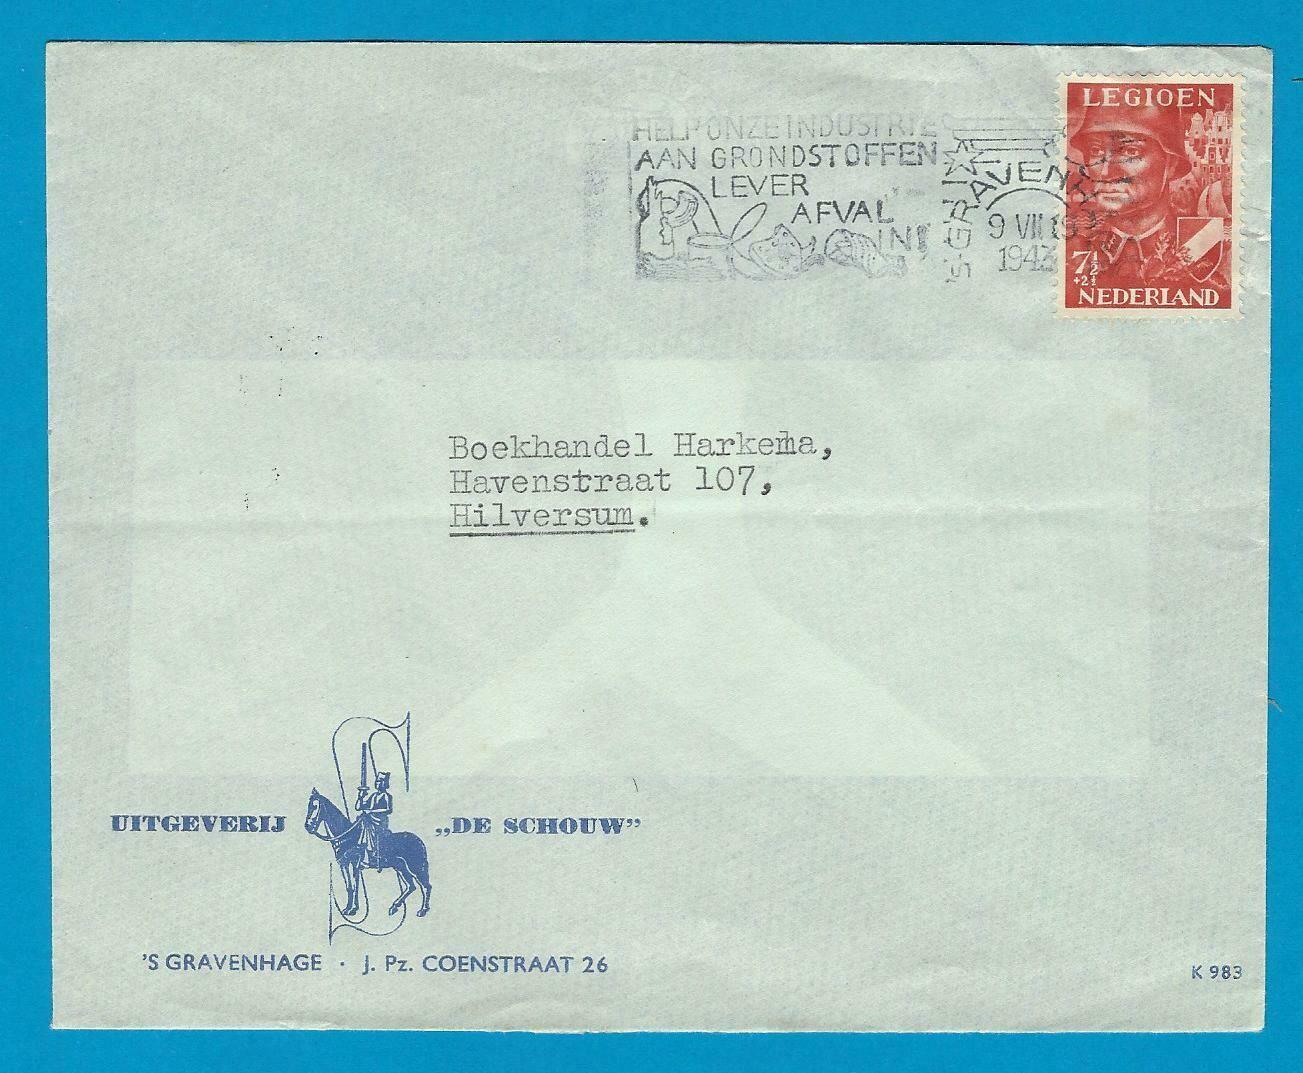 NEDERLAND brief 1943 's Gravenhage legioen zegel